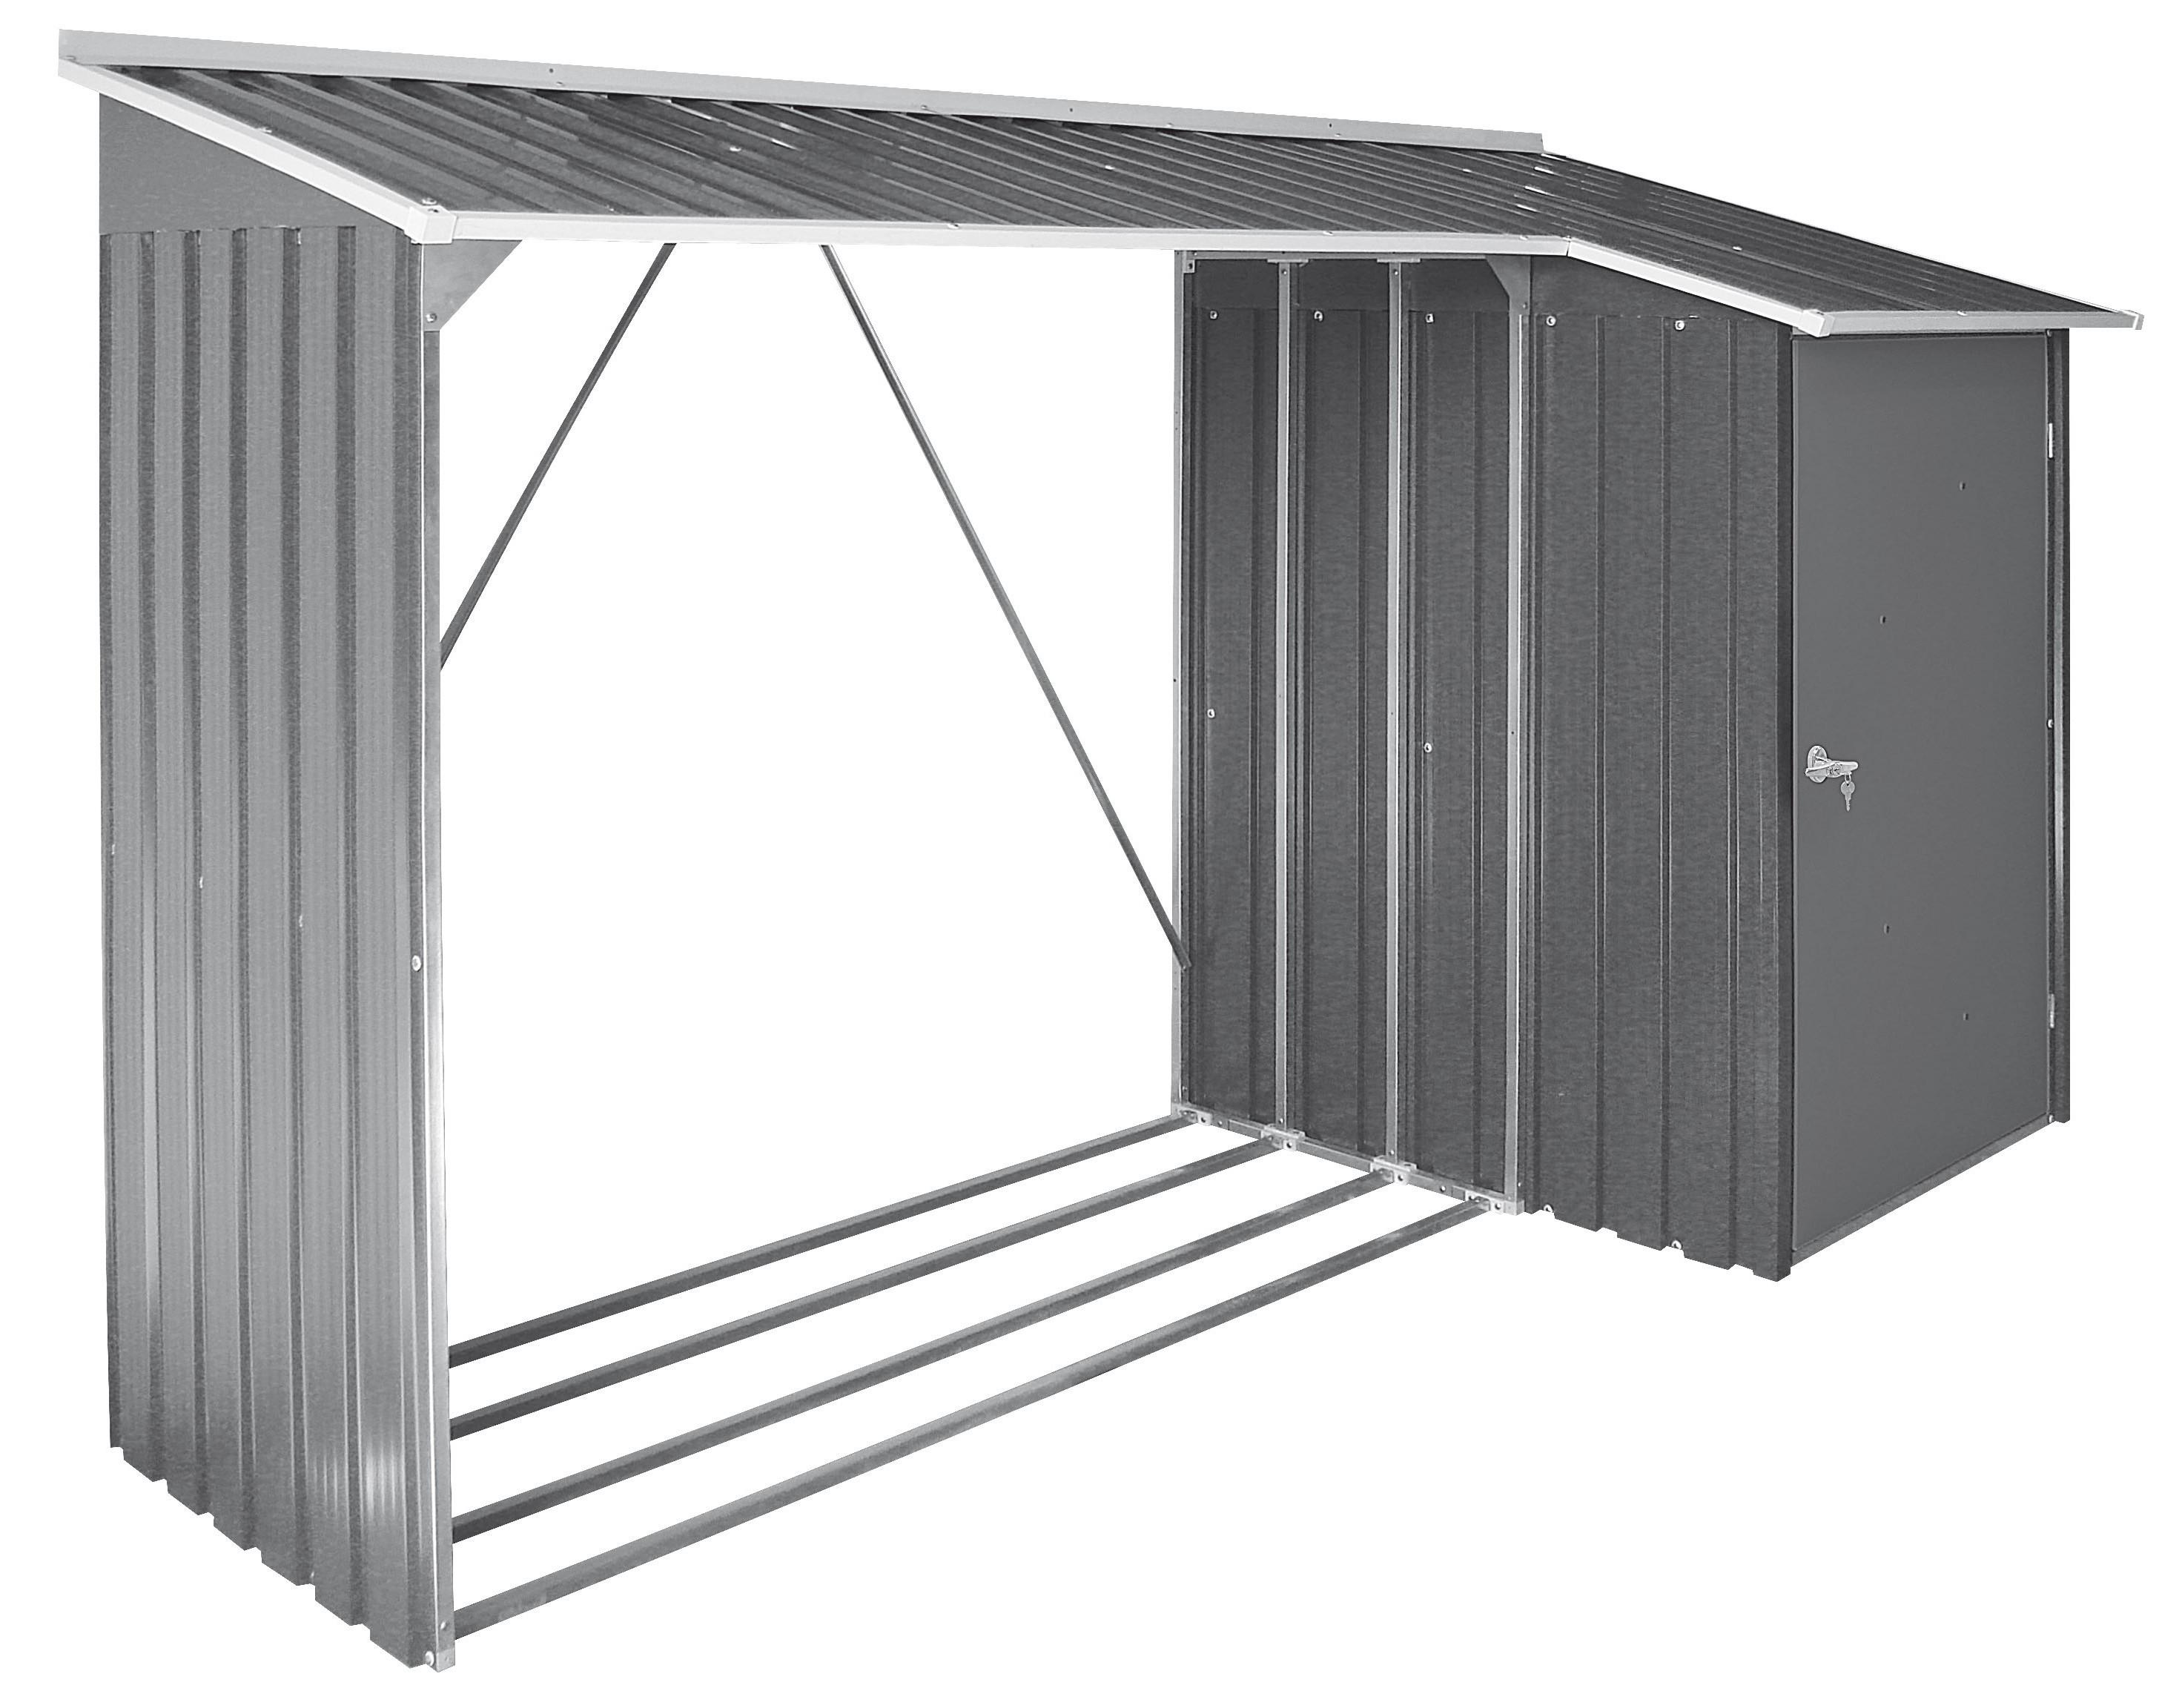 duramax kaminholzregal mit ger teschrank metall 262x100cm anthrazit bei. Black Bedroom Furniture Sets. Home Design Ideas